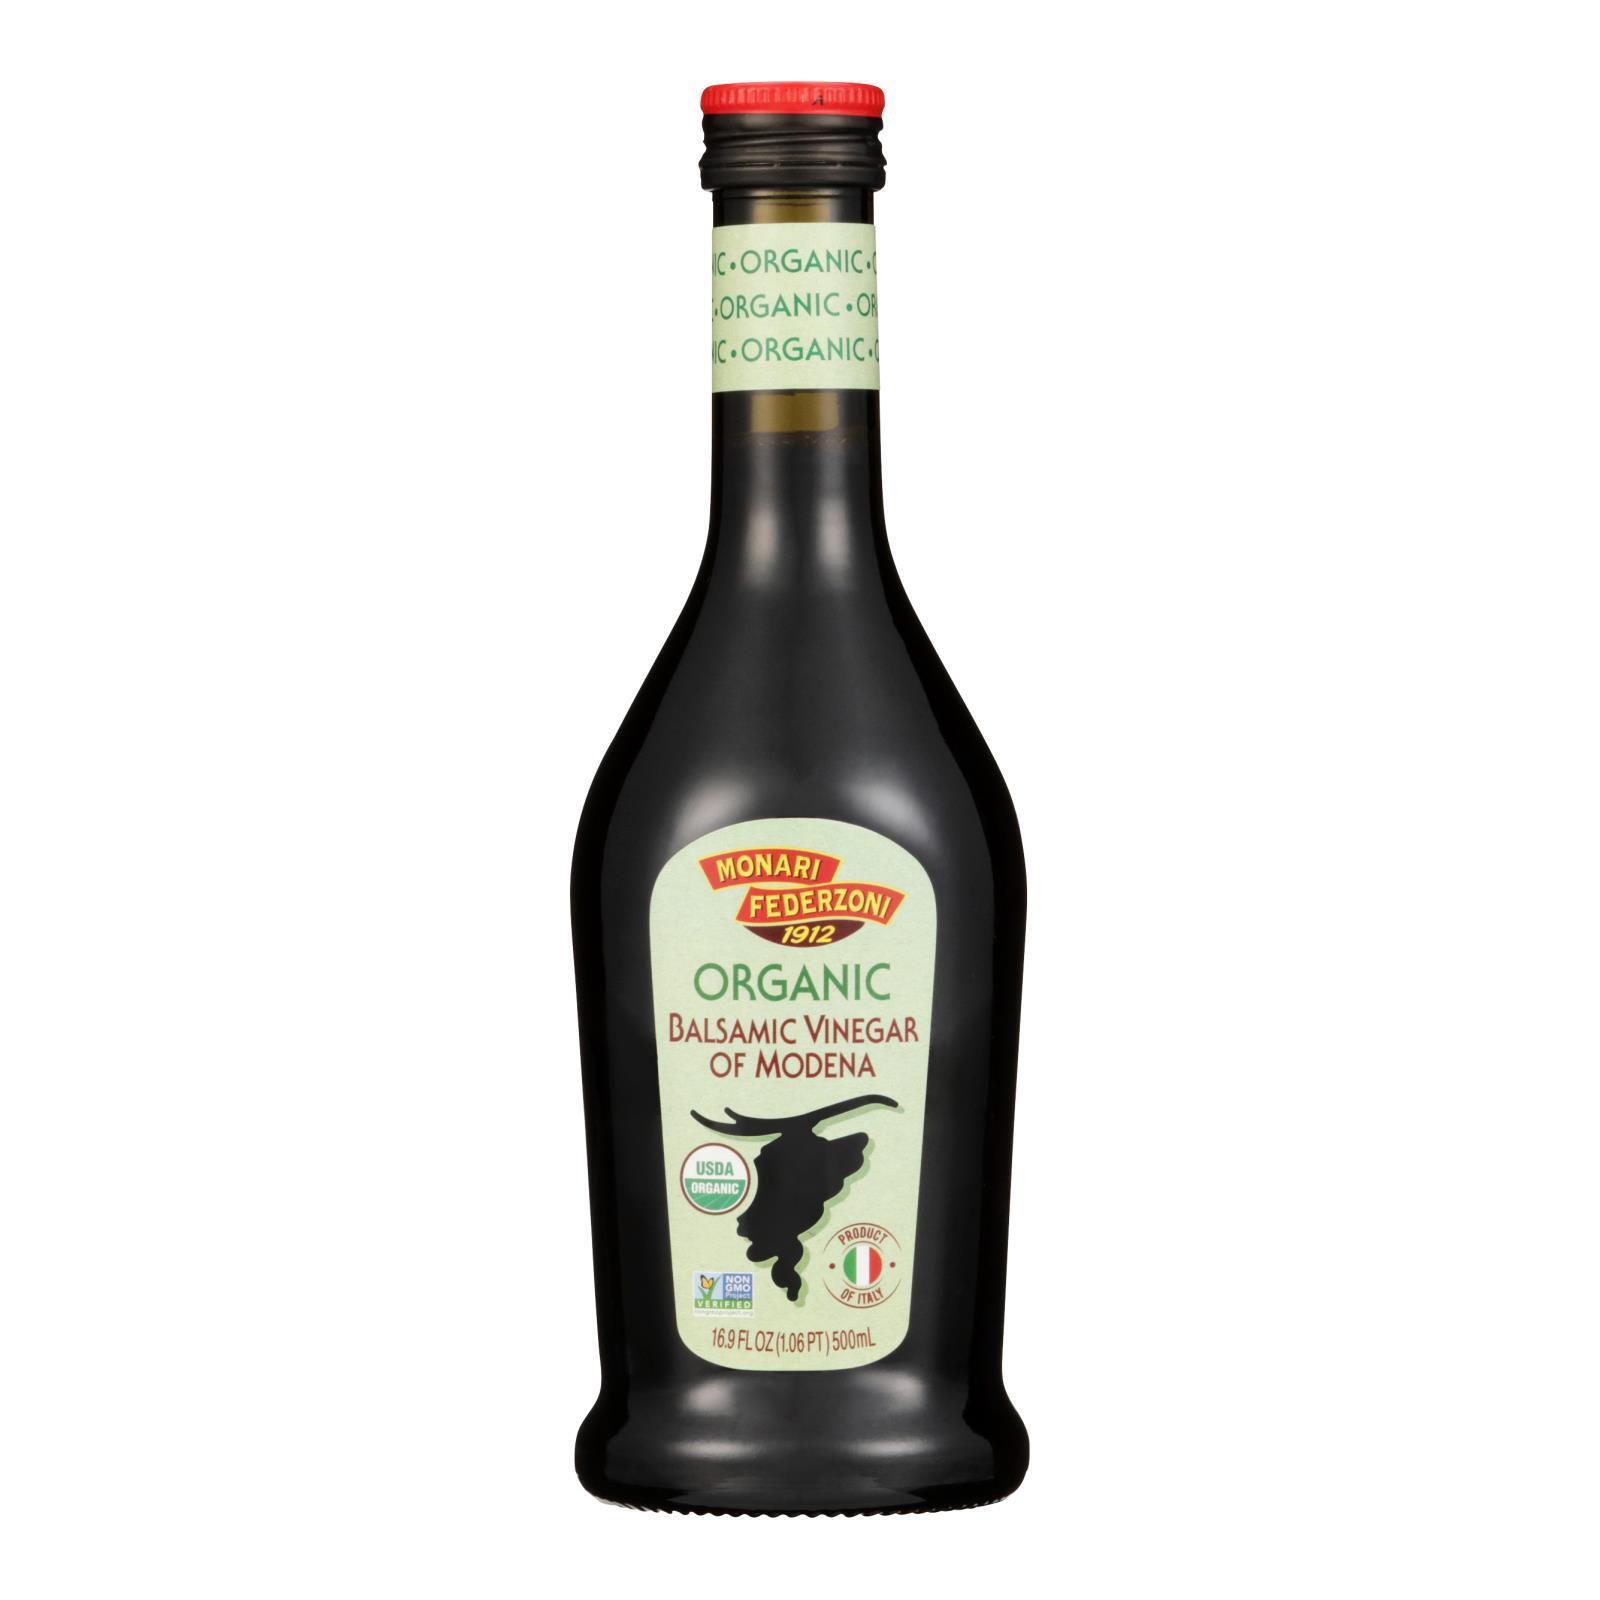 Monari Federzoni Balsamic Vinegar of Modena - Organic - Case of 6 - 17 Fl oz.